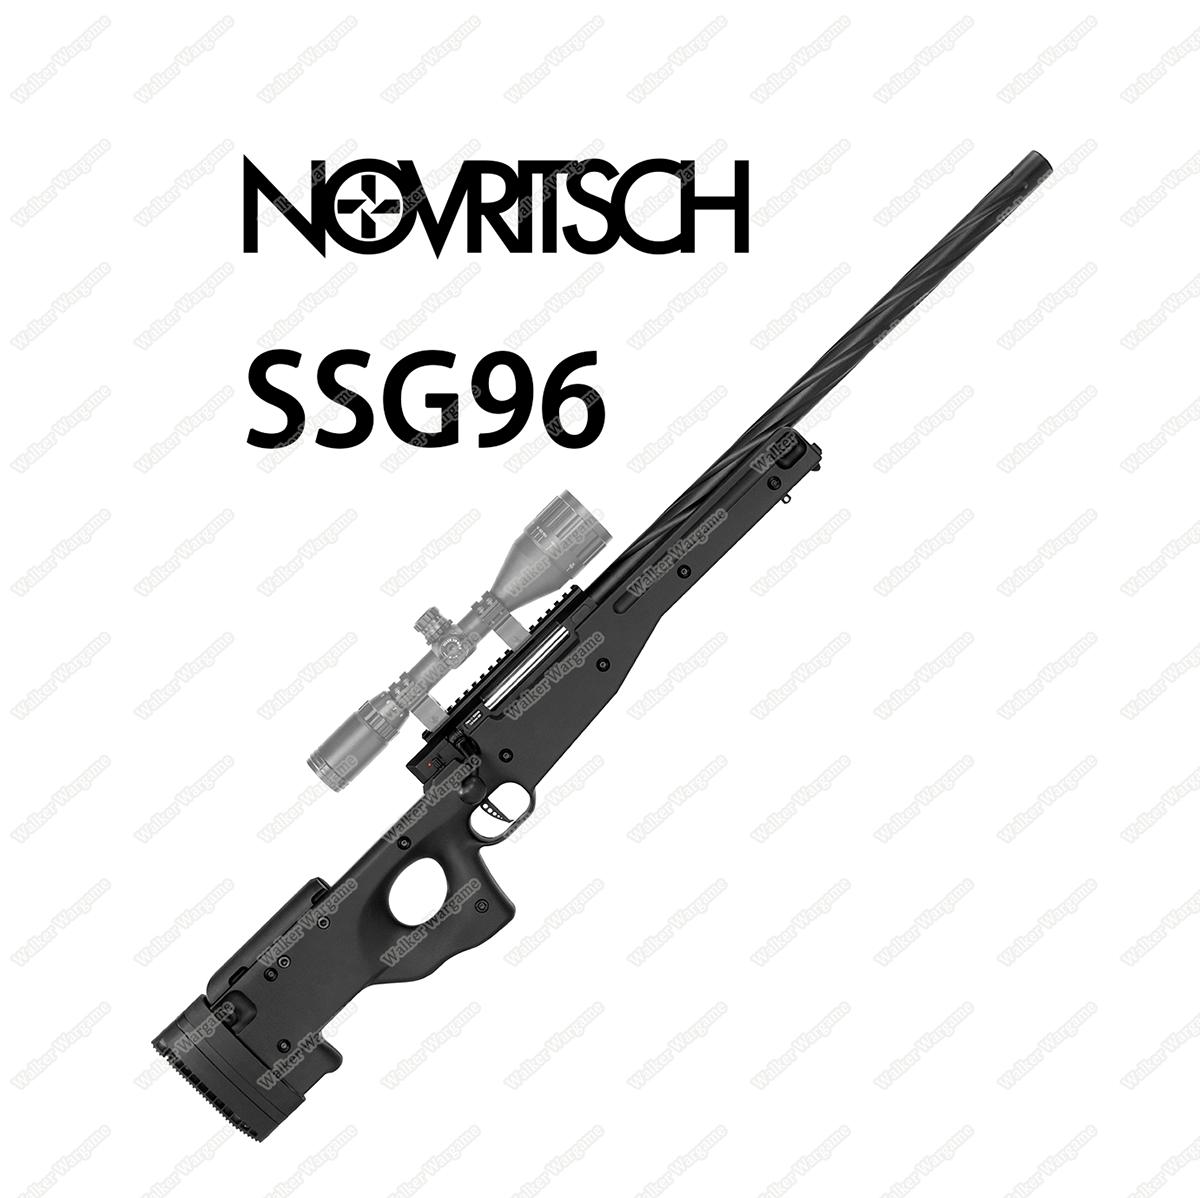 Novritsch SSG96 Airsoft Sniper 2.8Joules 500fps M160 Spring